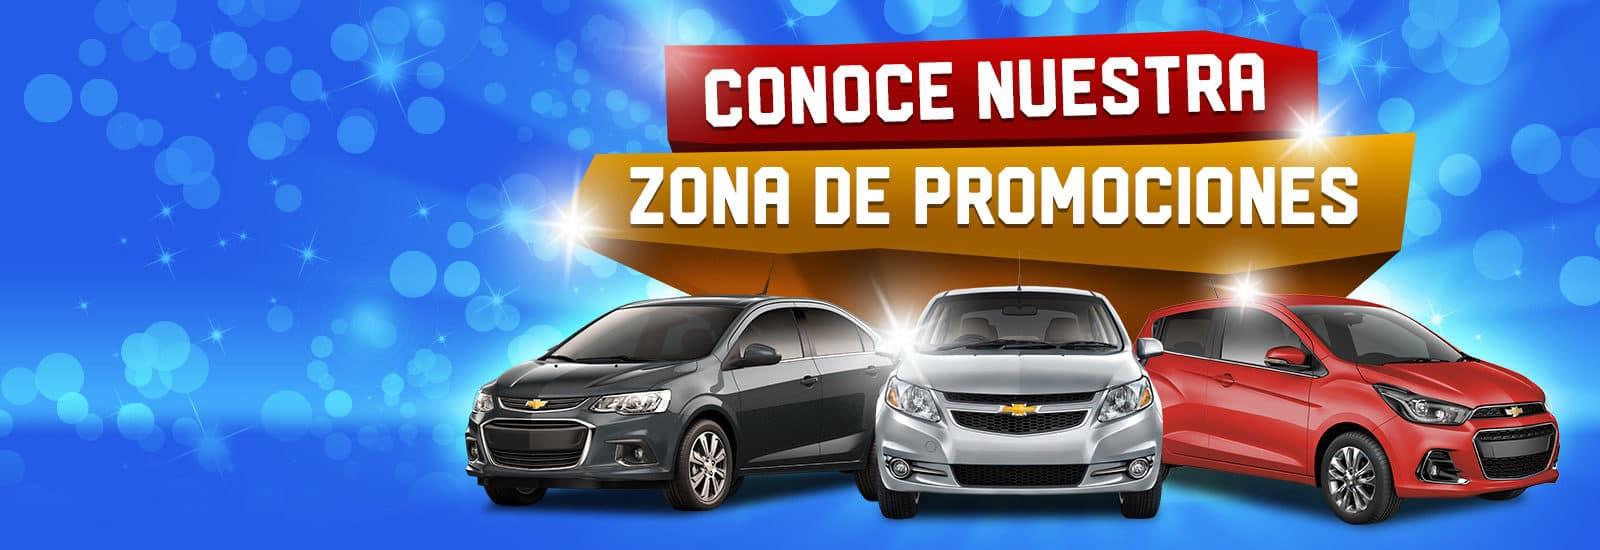 Banner-Zona-Promo